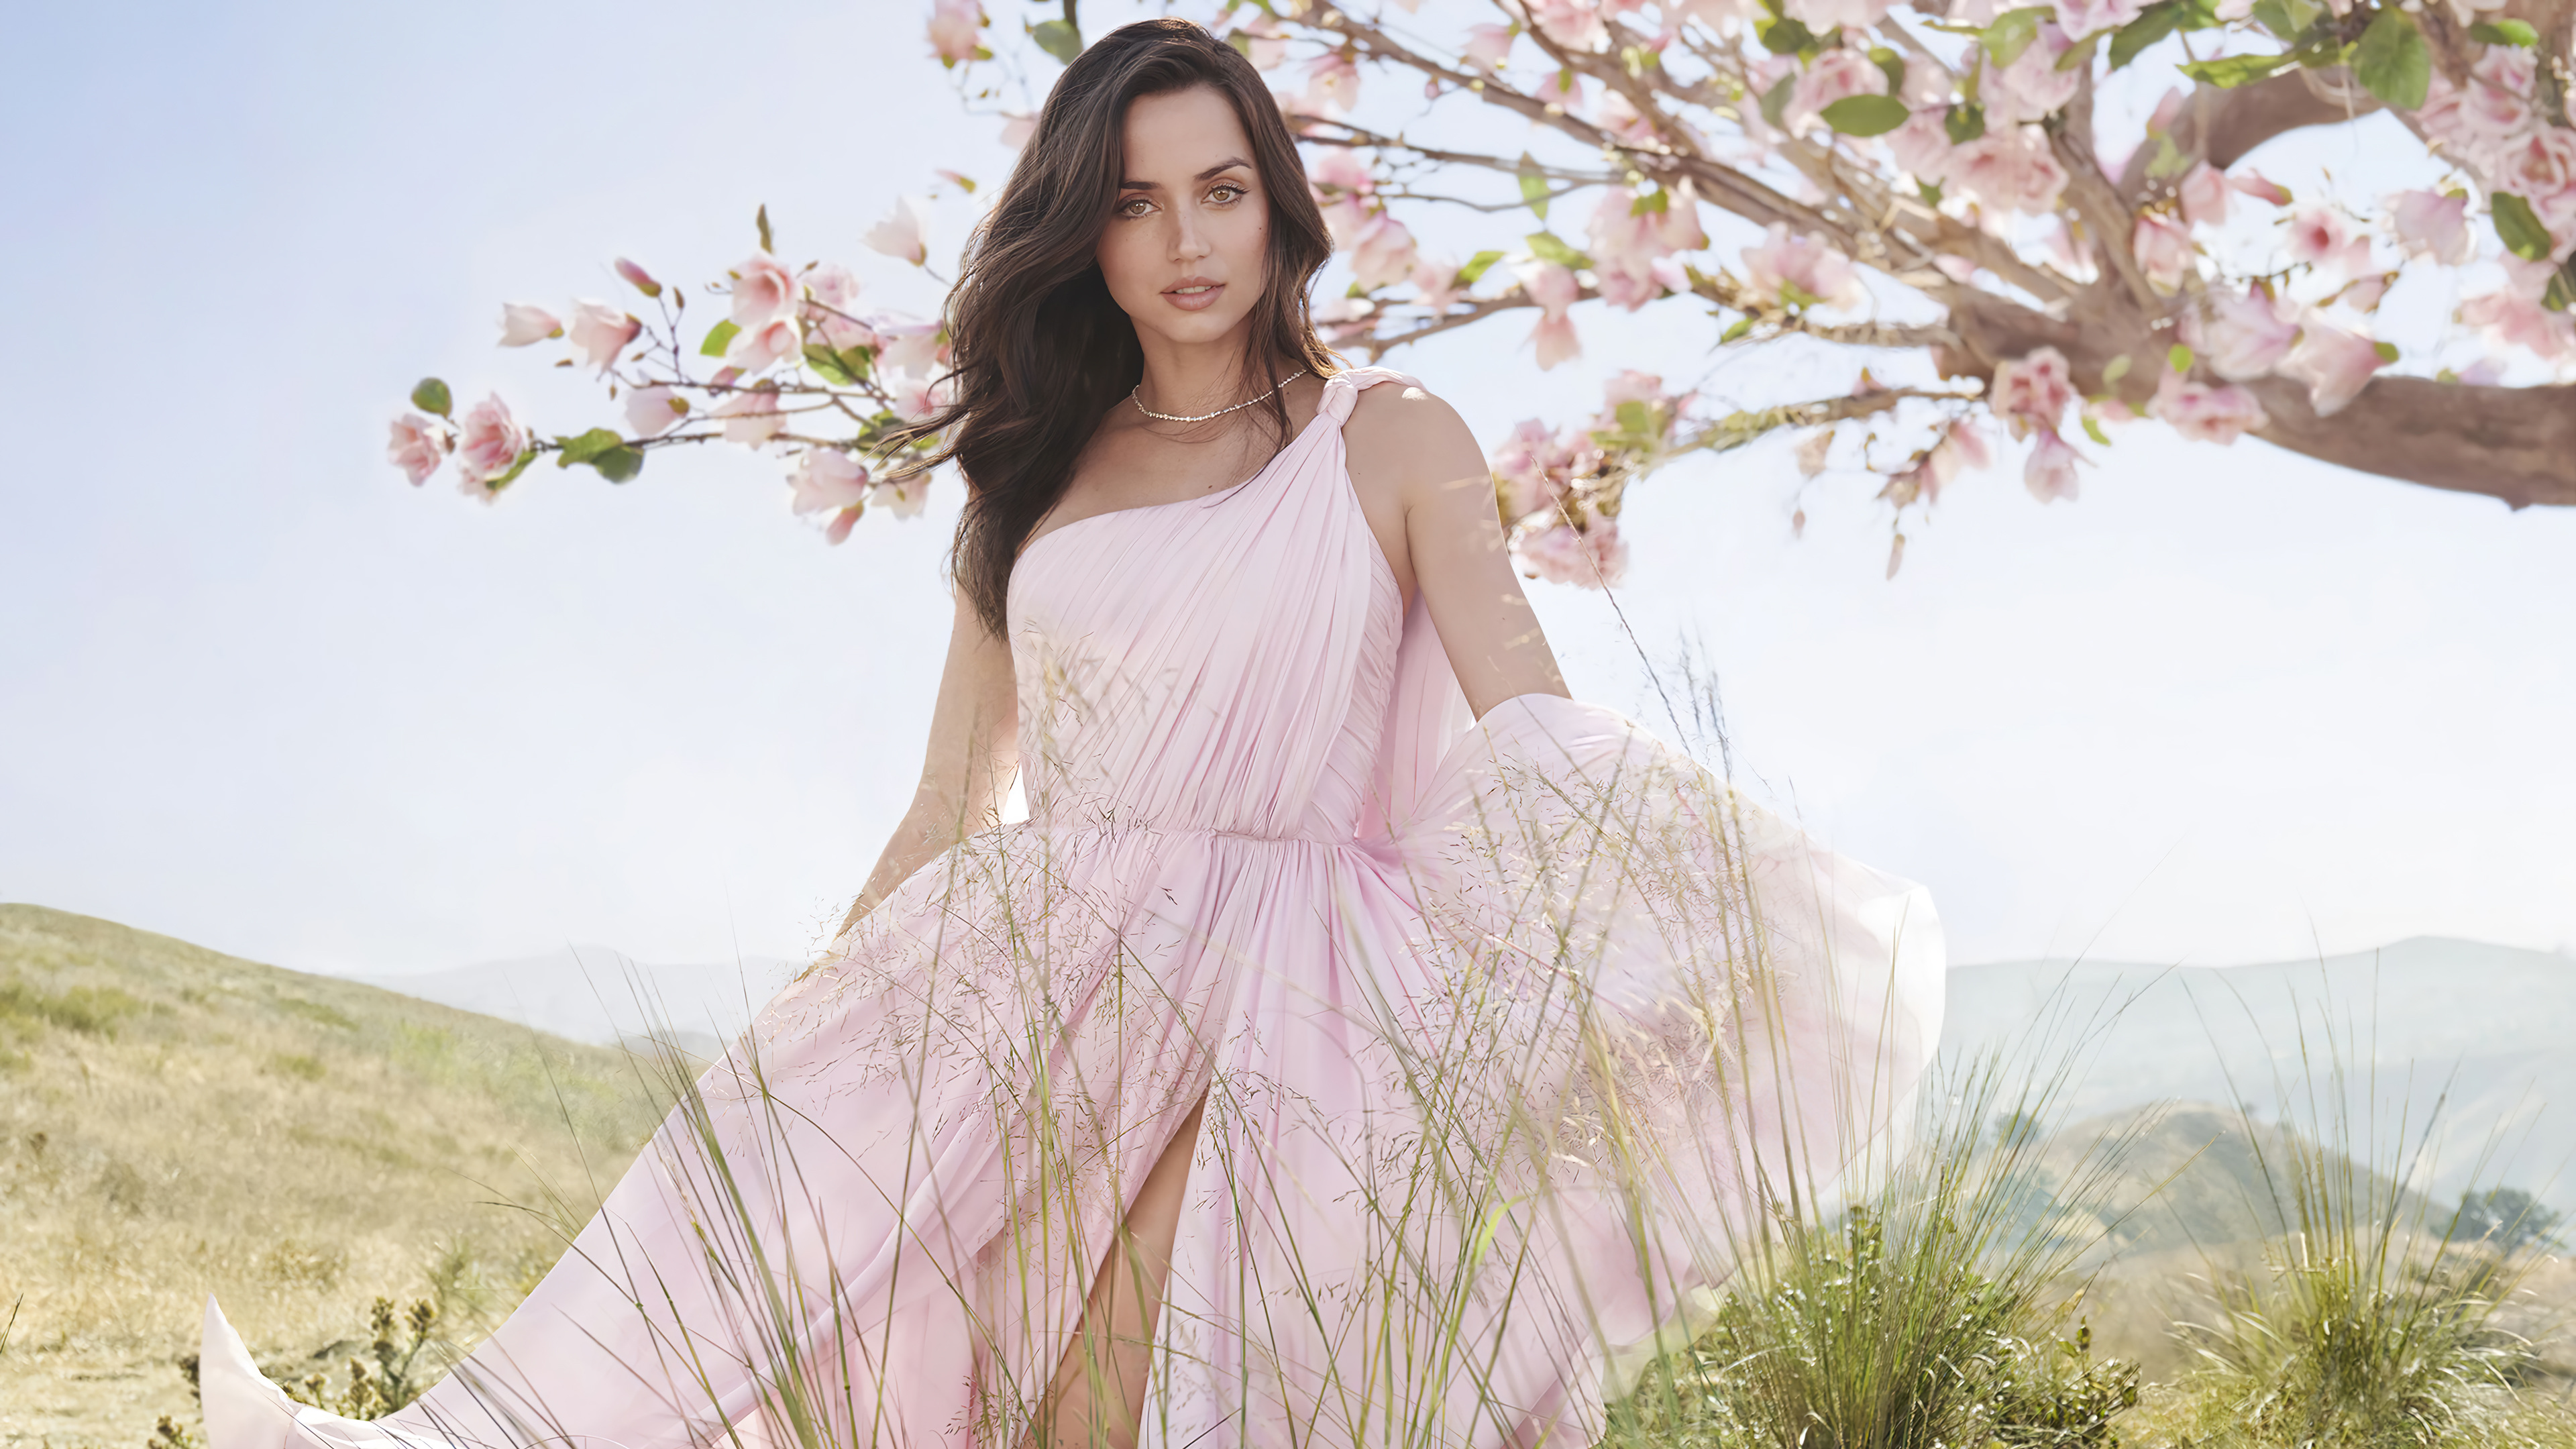 Wallpaper Ana de armas pink dress in the countryside